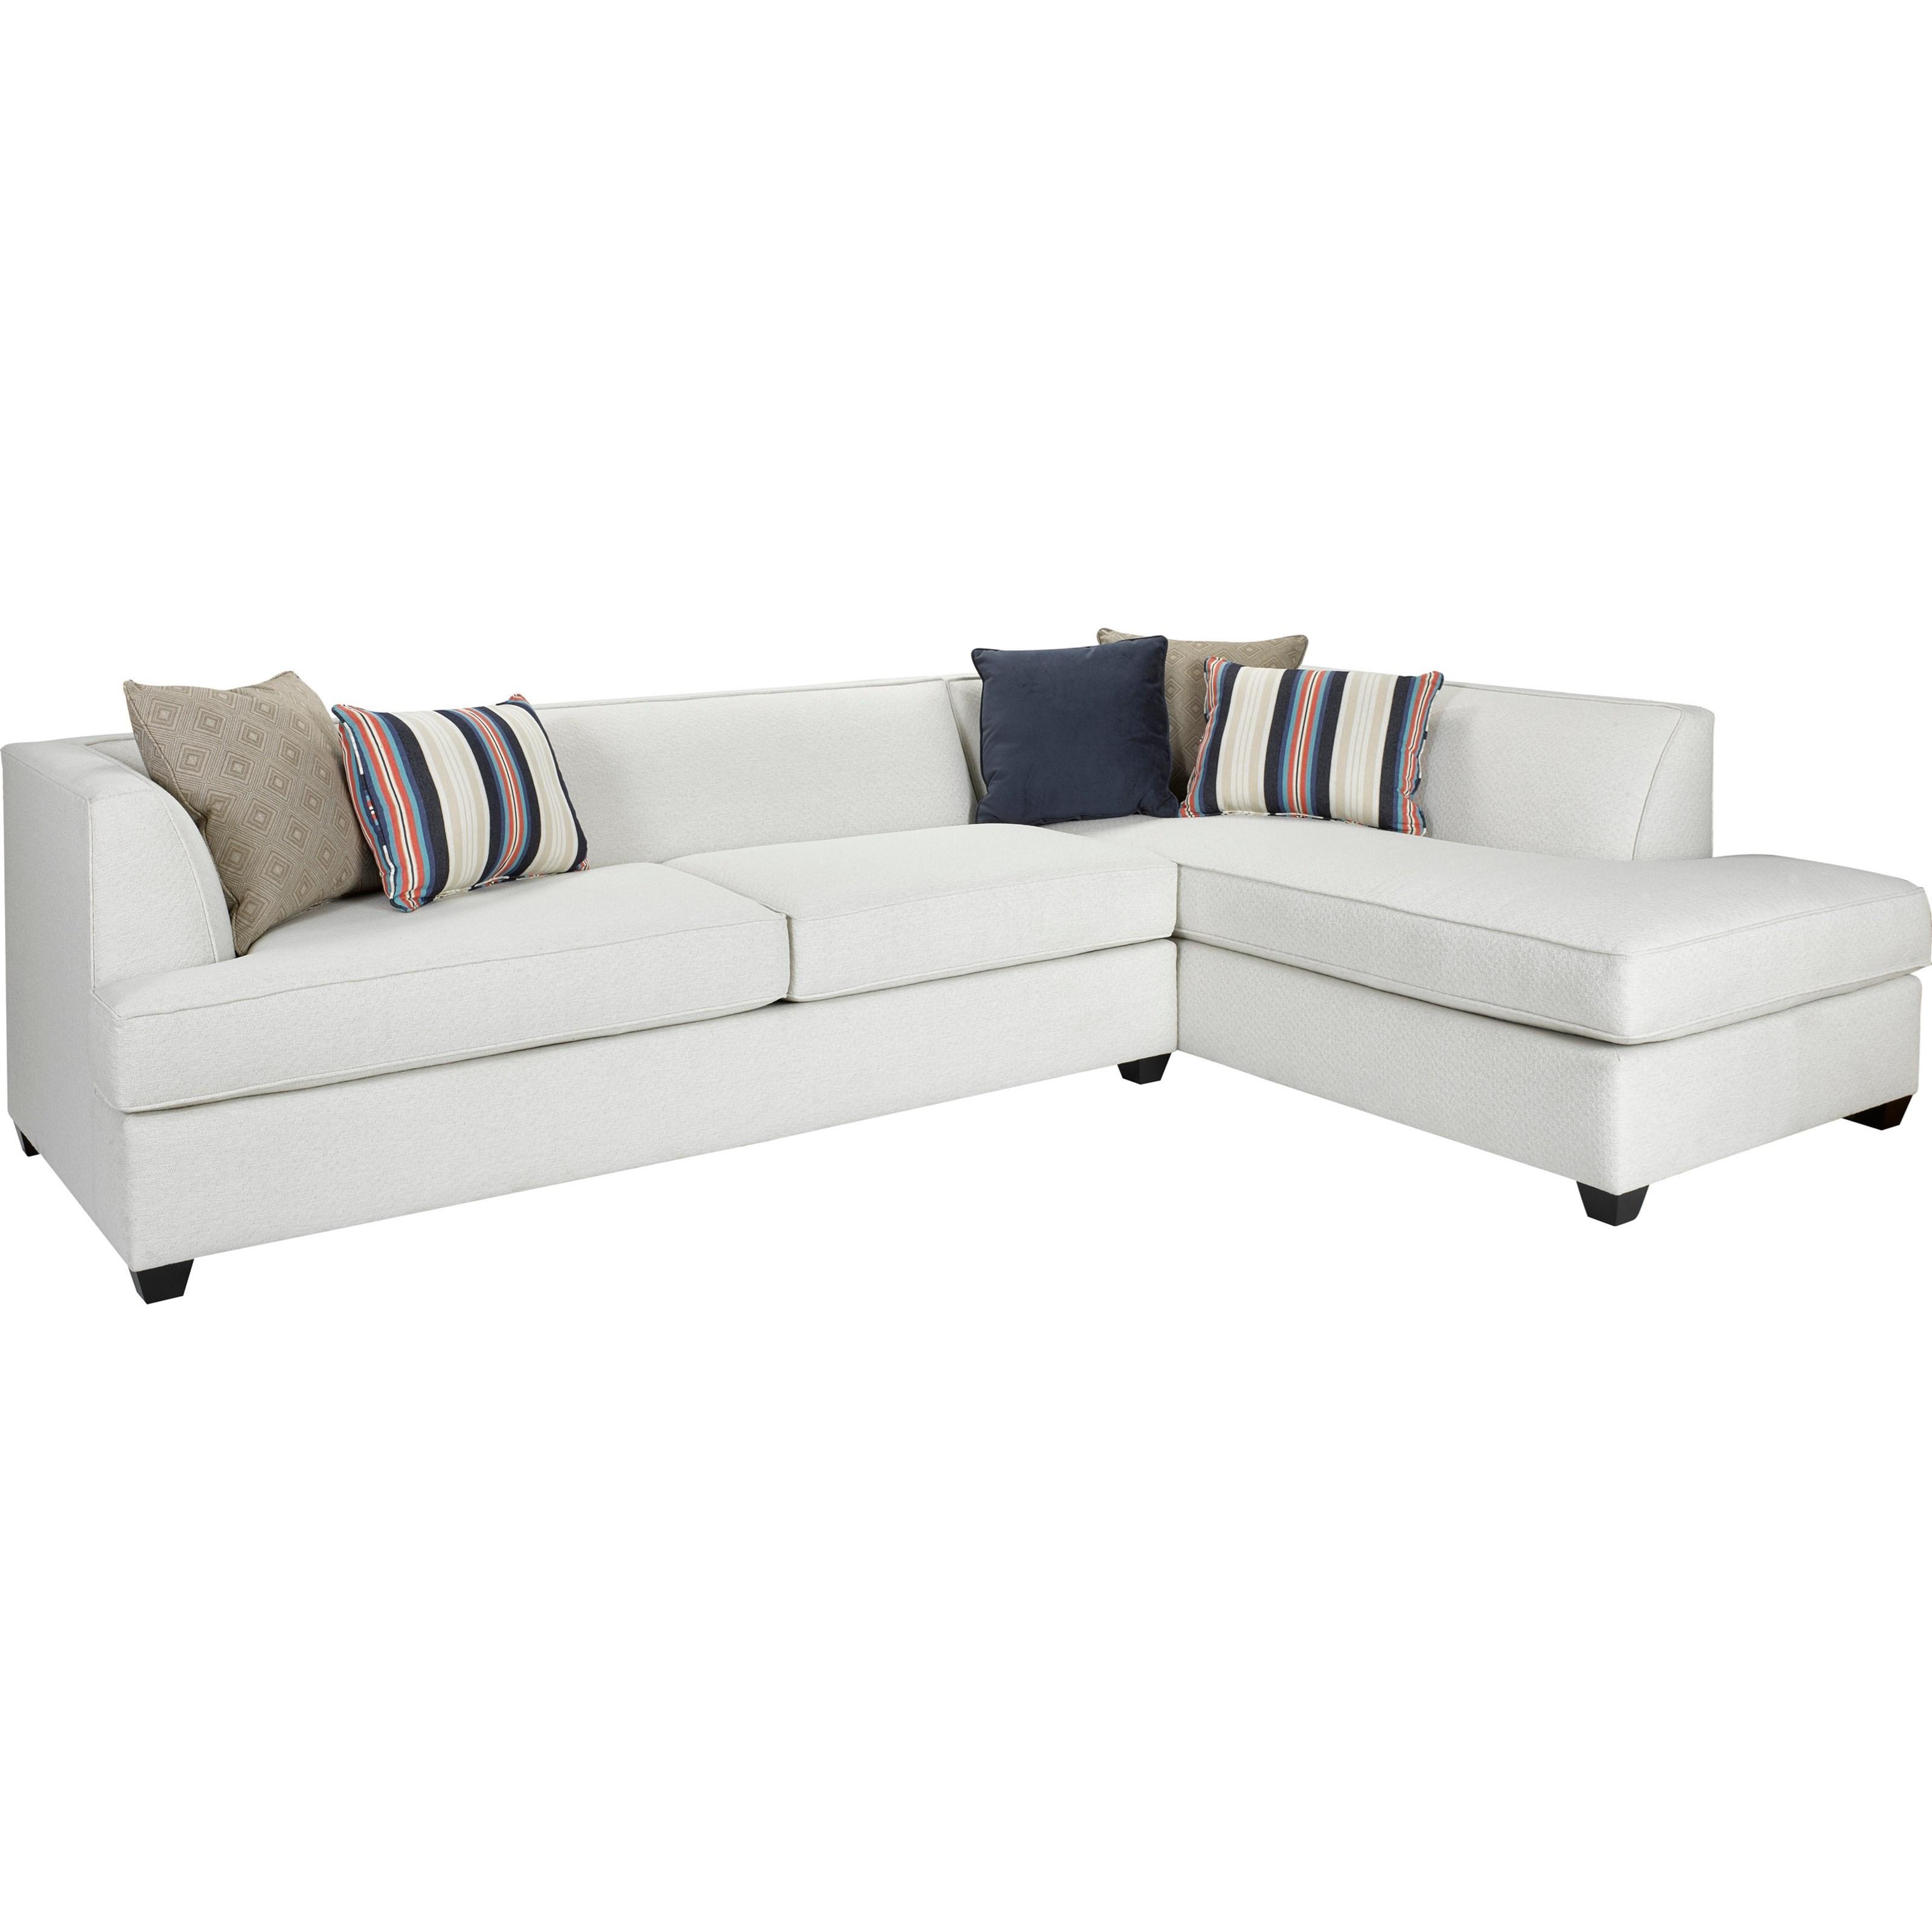 Broyhill furniture farida 2 piece sectional sofa with raf for Two piece sectional sofa with chaise